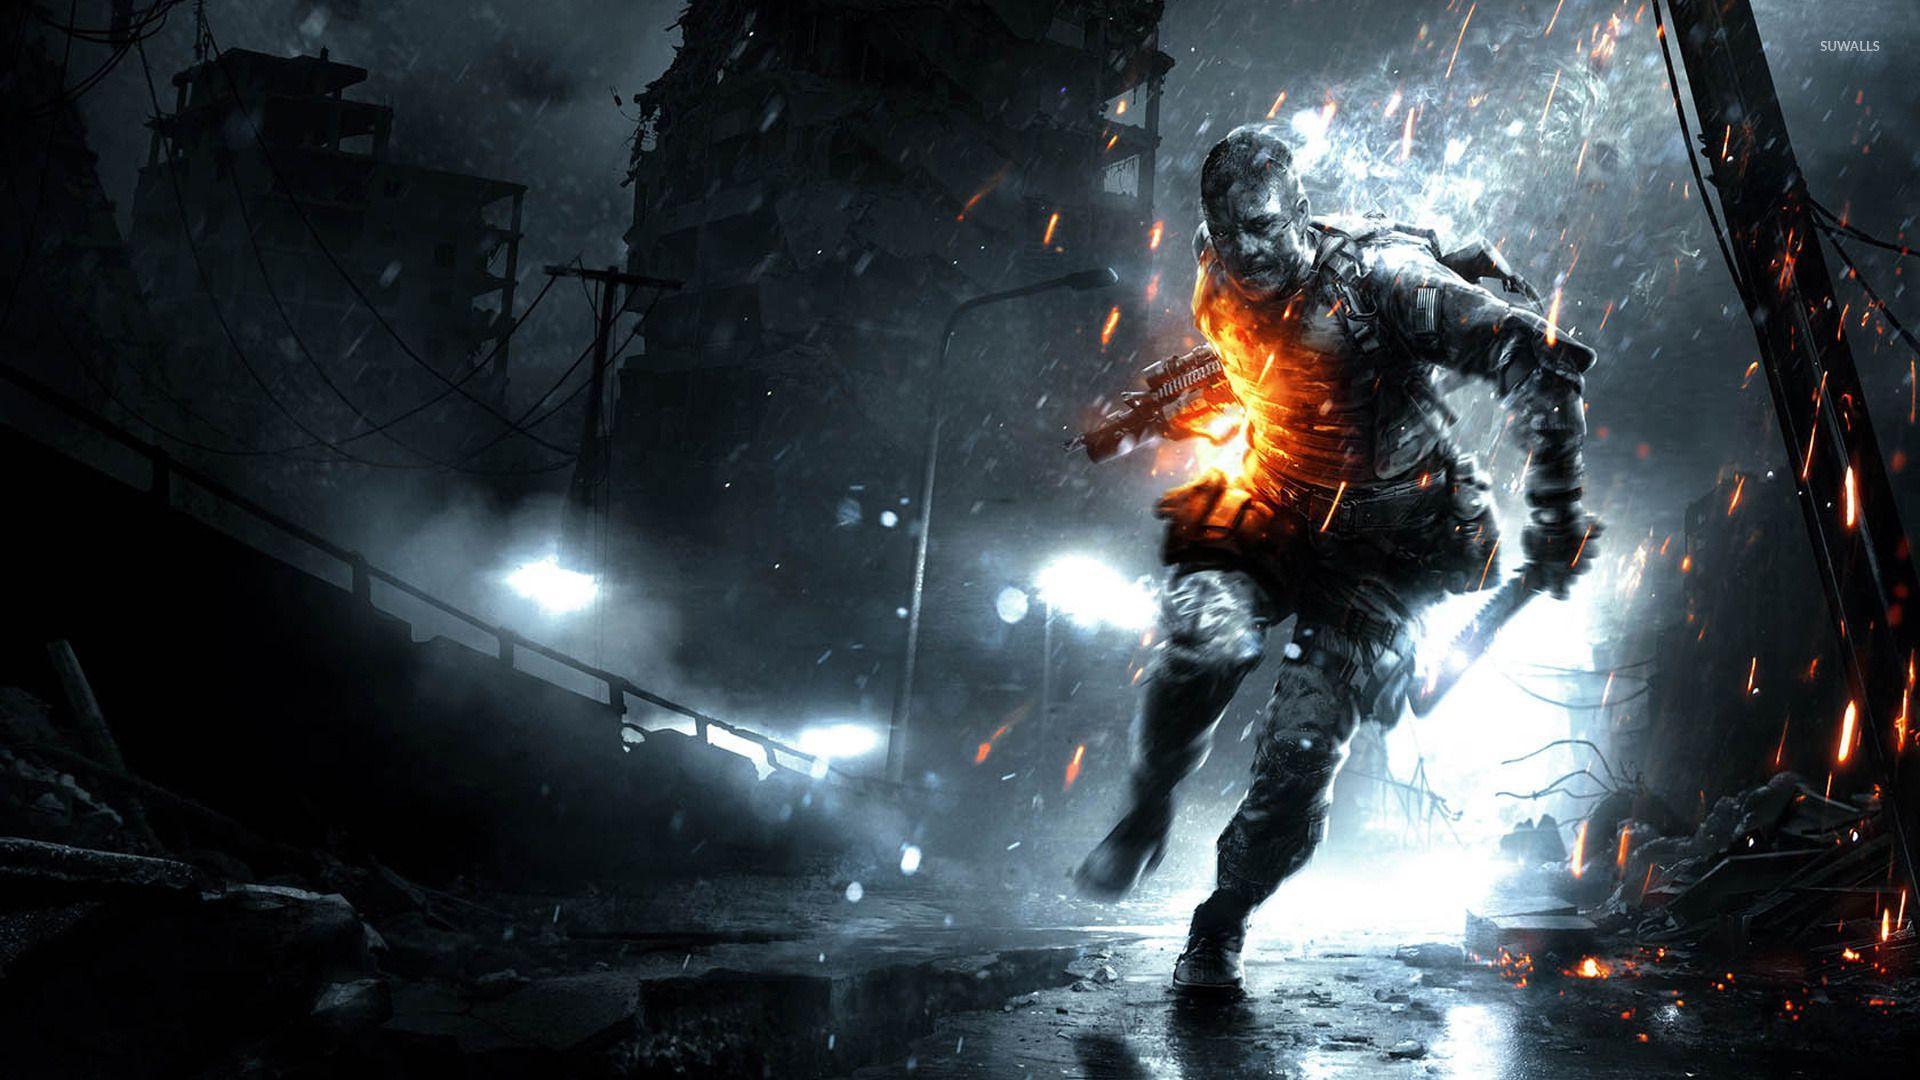 Battlefield 3 Wallpapers Top Free Battlefield 3 Backgrounds